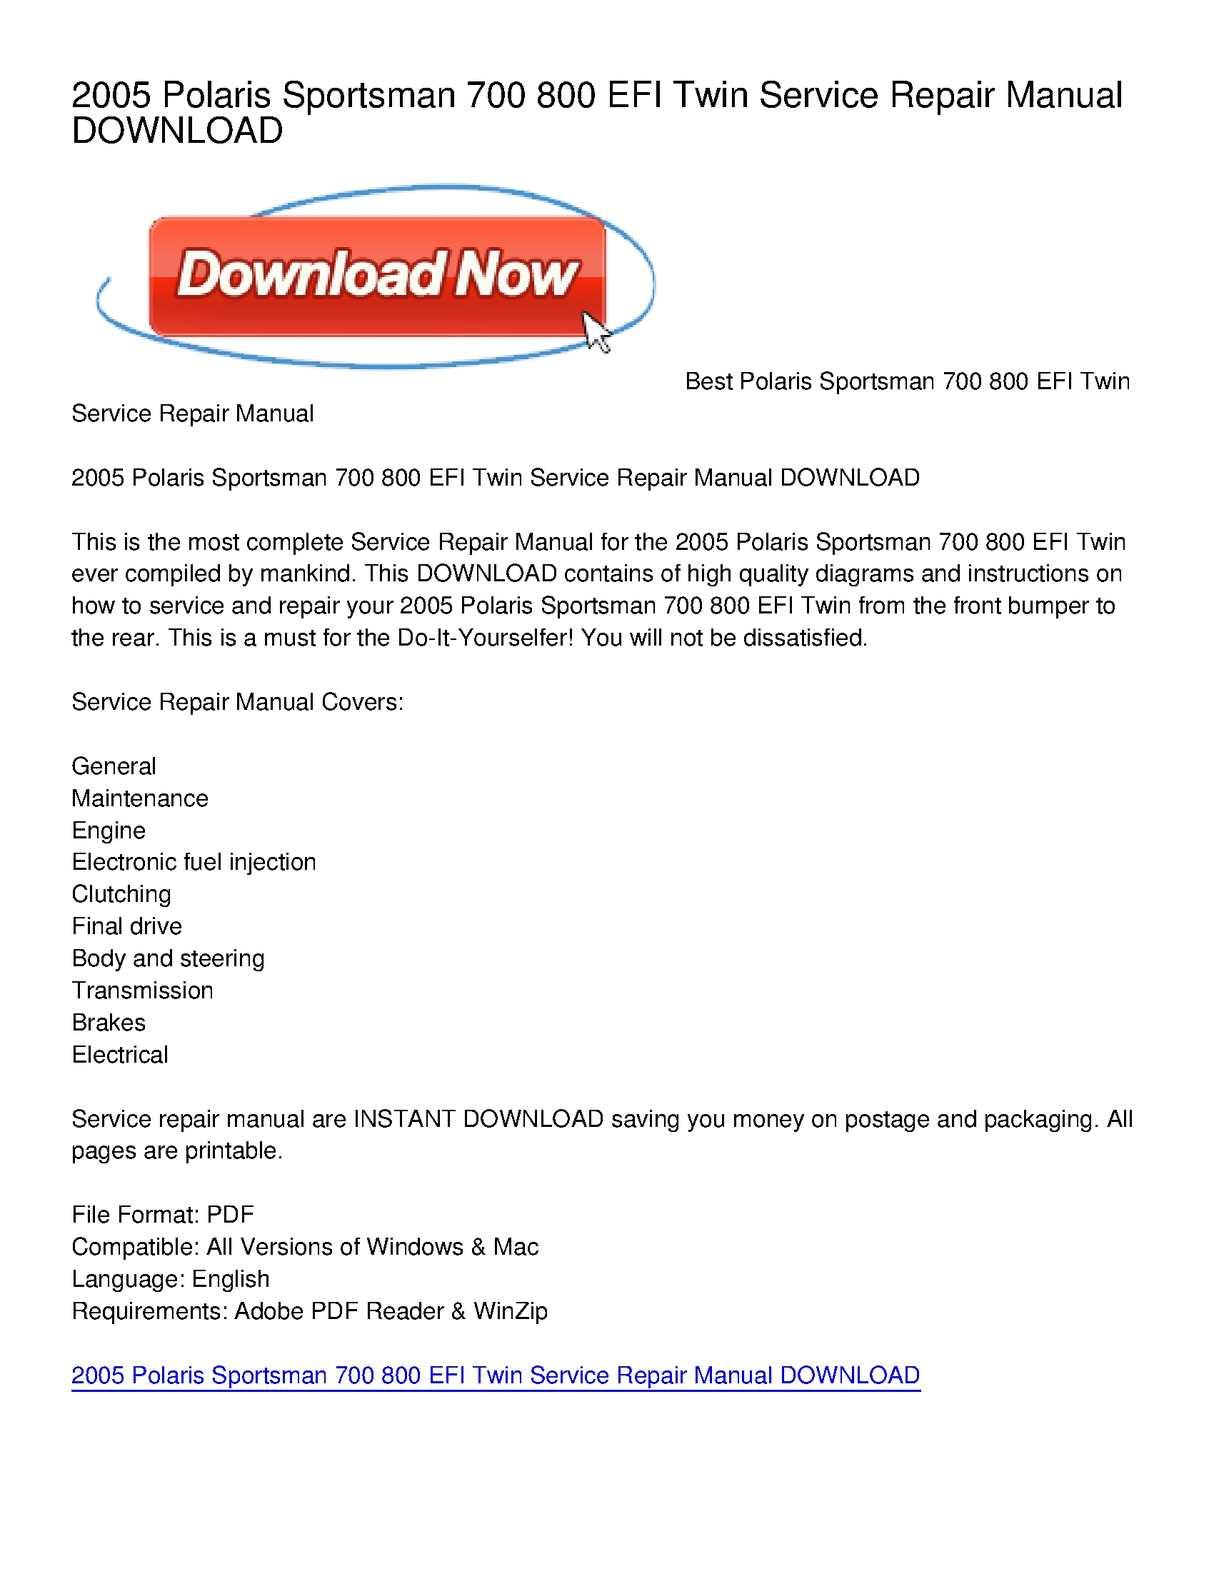 Calaméo - 2005 Polaris Sportsman 700 800 EFI Twin Service Repair Manual  DOWNLOAD